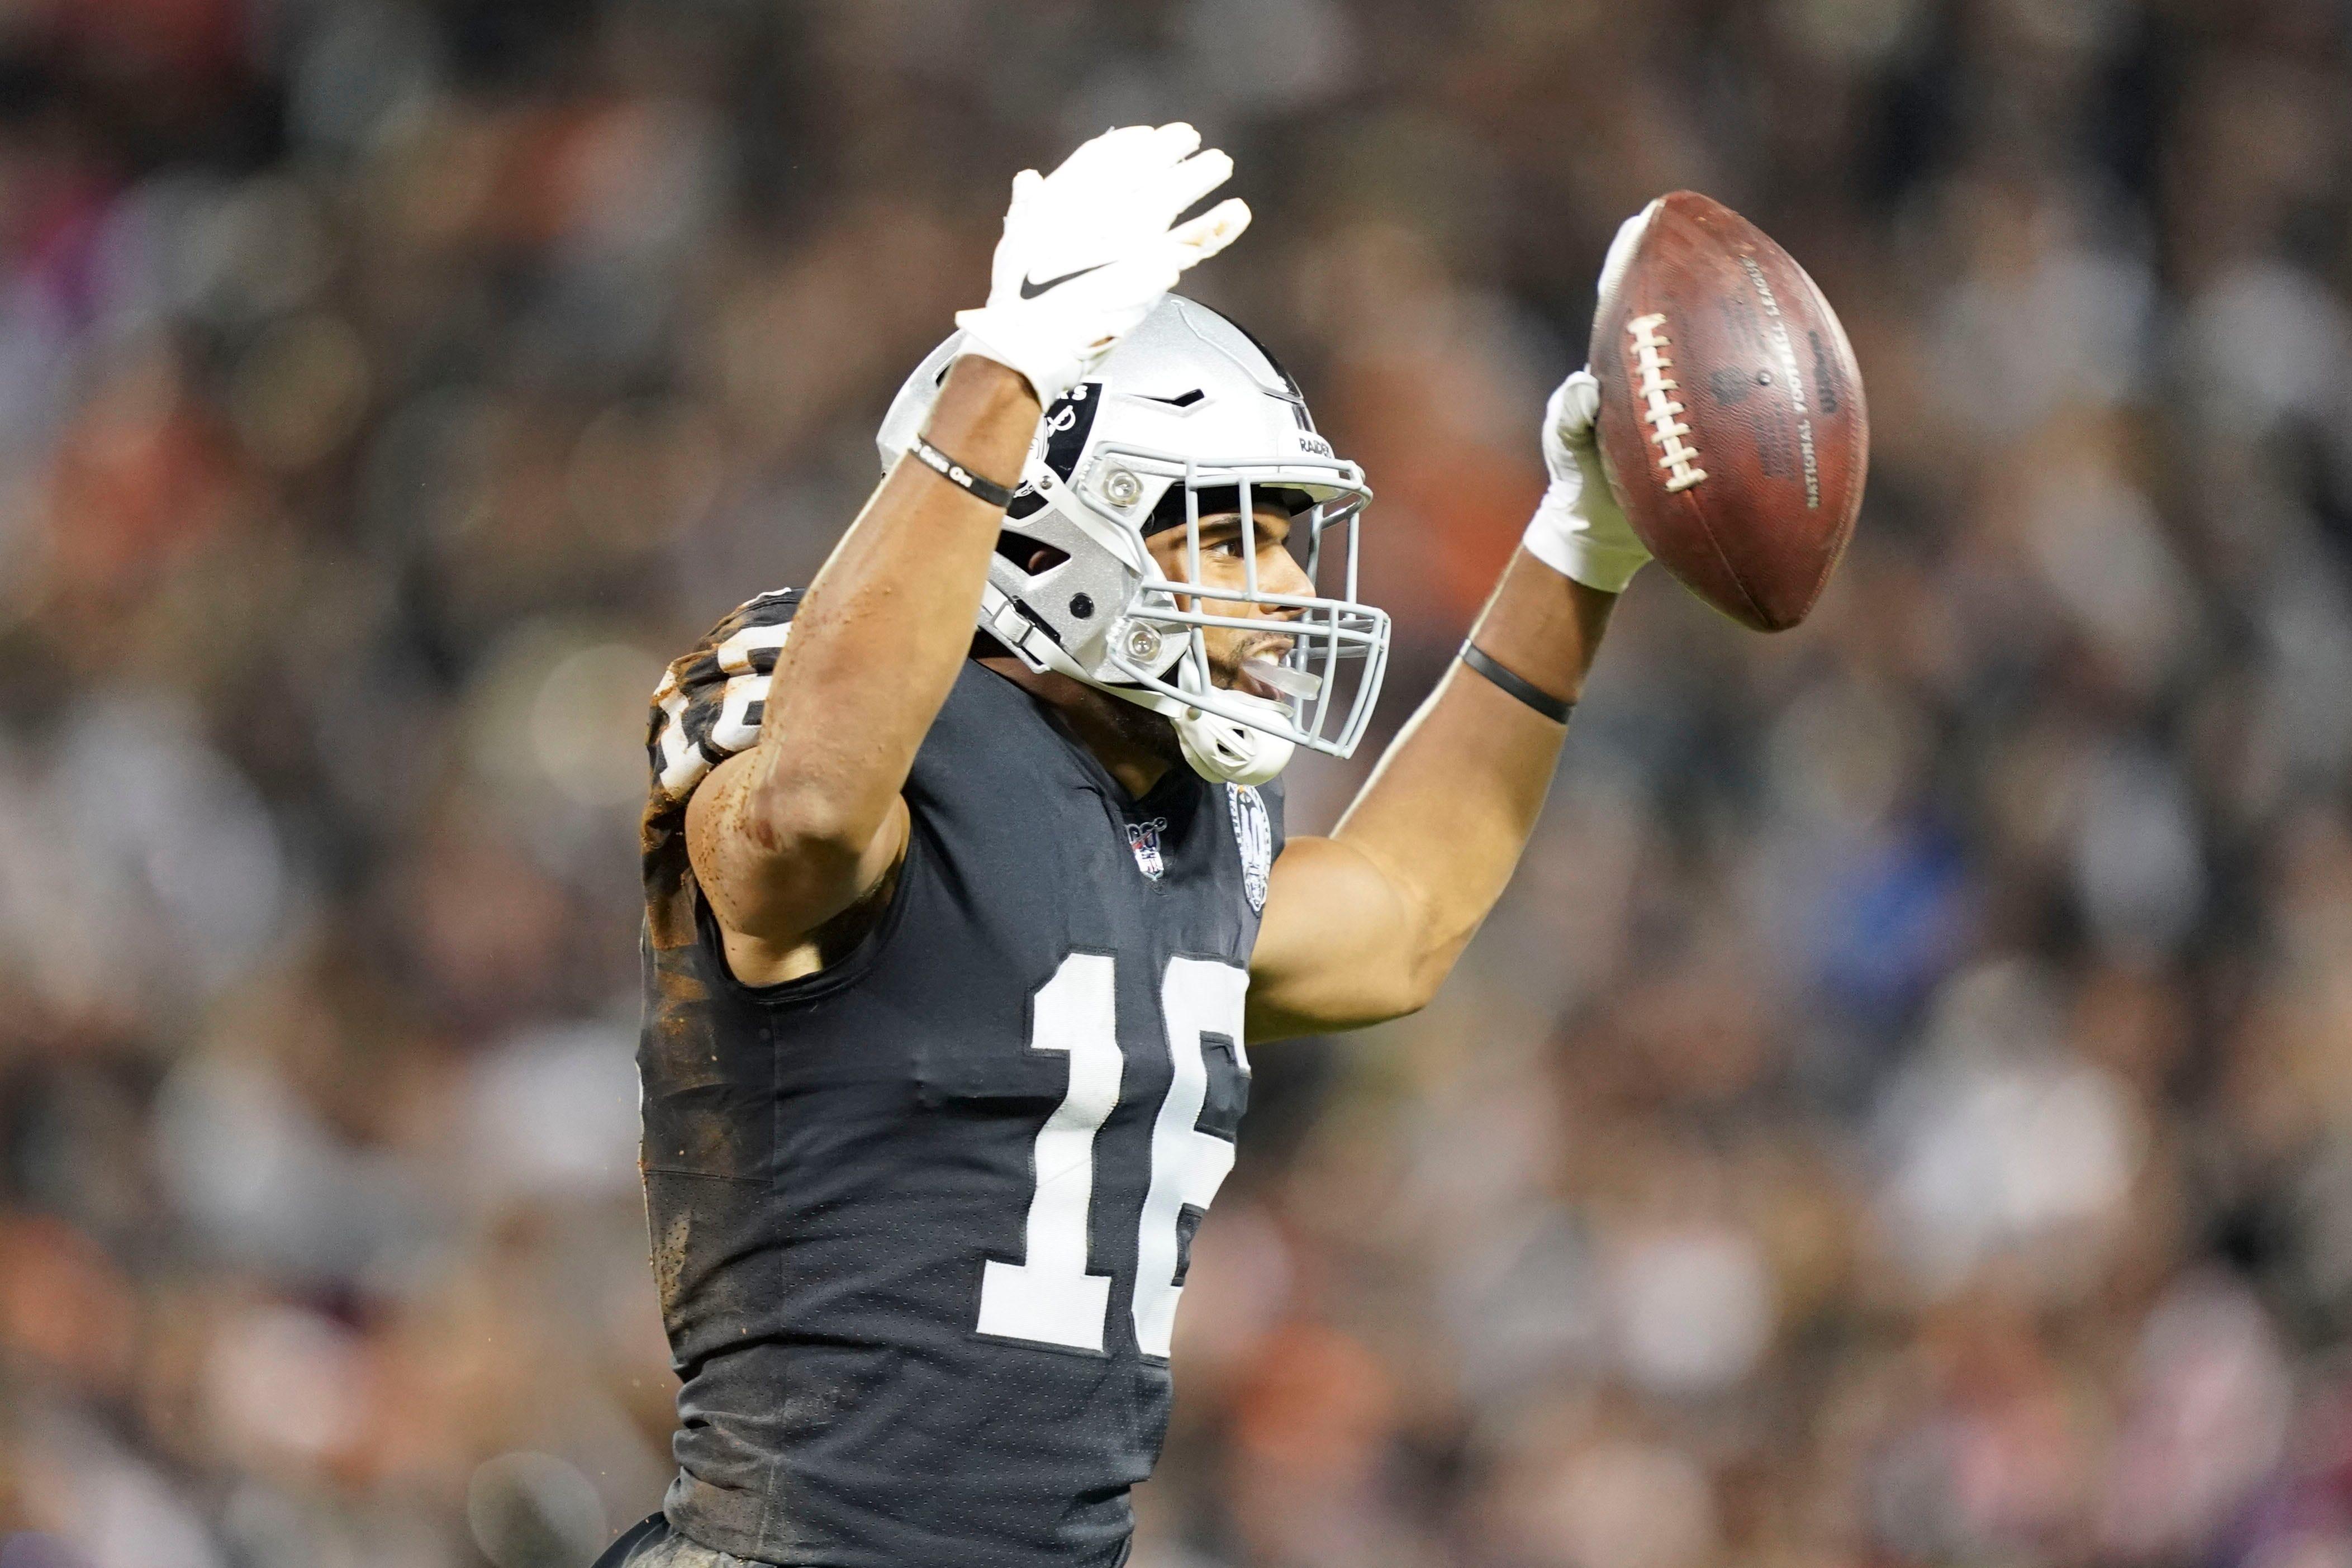 Raiders move on from Antonio Brown drama with season-opening win vs. Broncos thumbnail